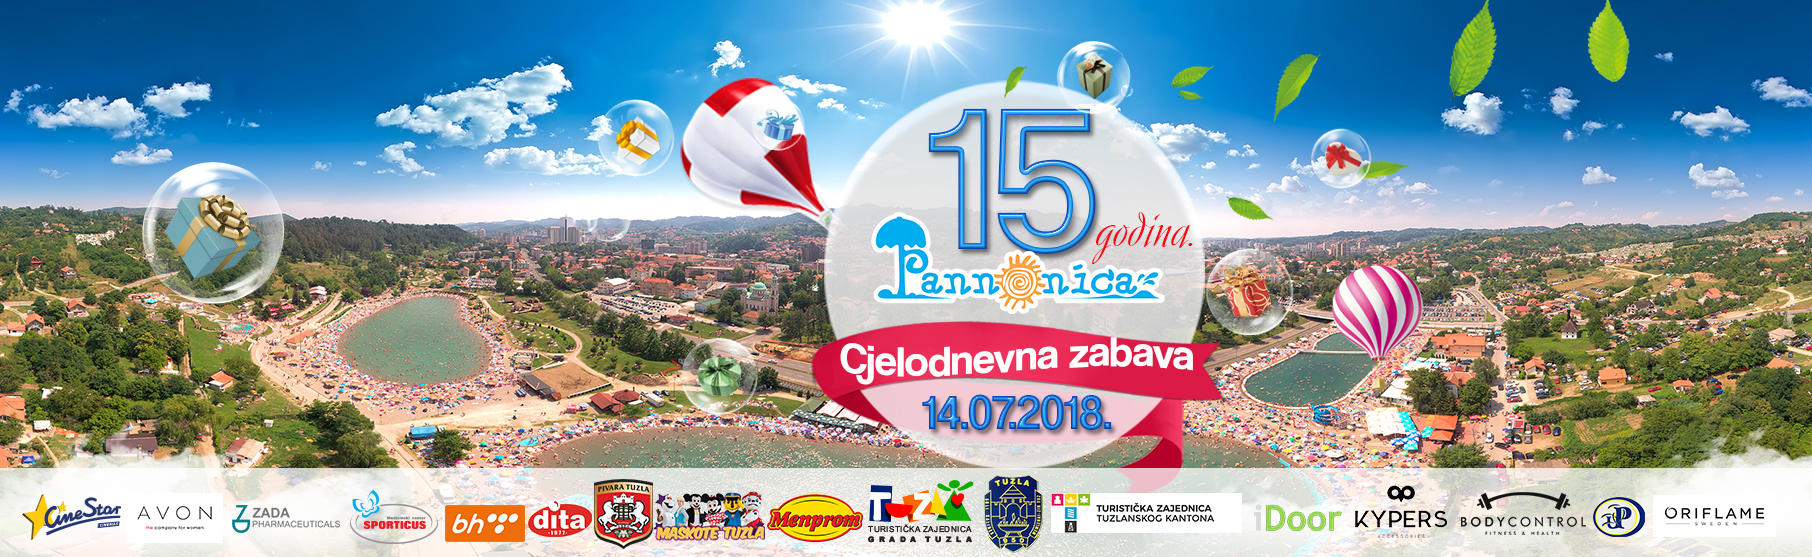 cover Cjelodnevna zabava 14.07.2018.